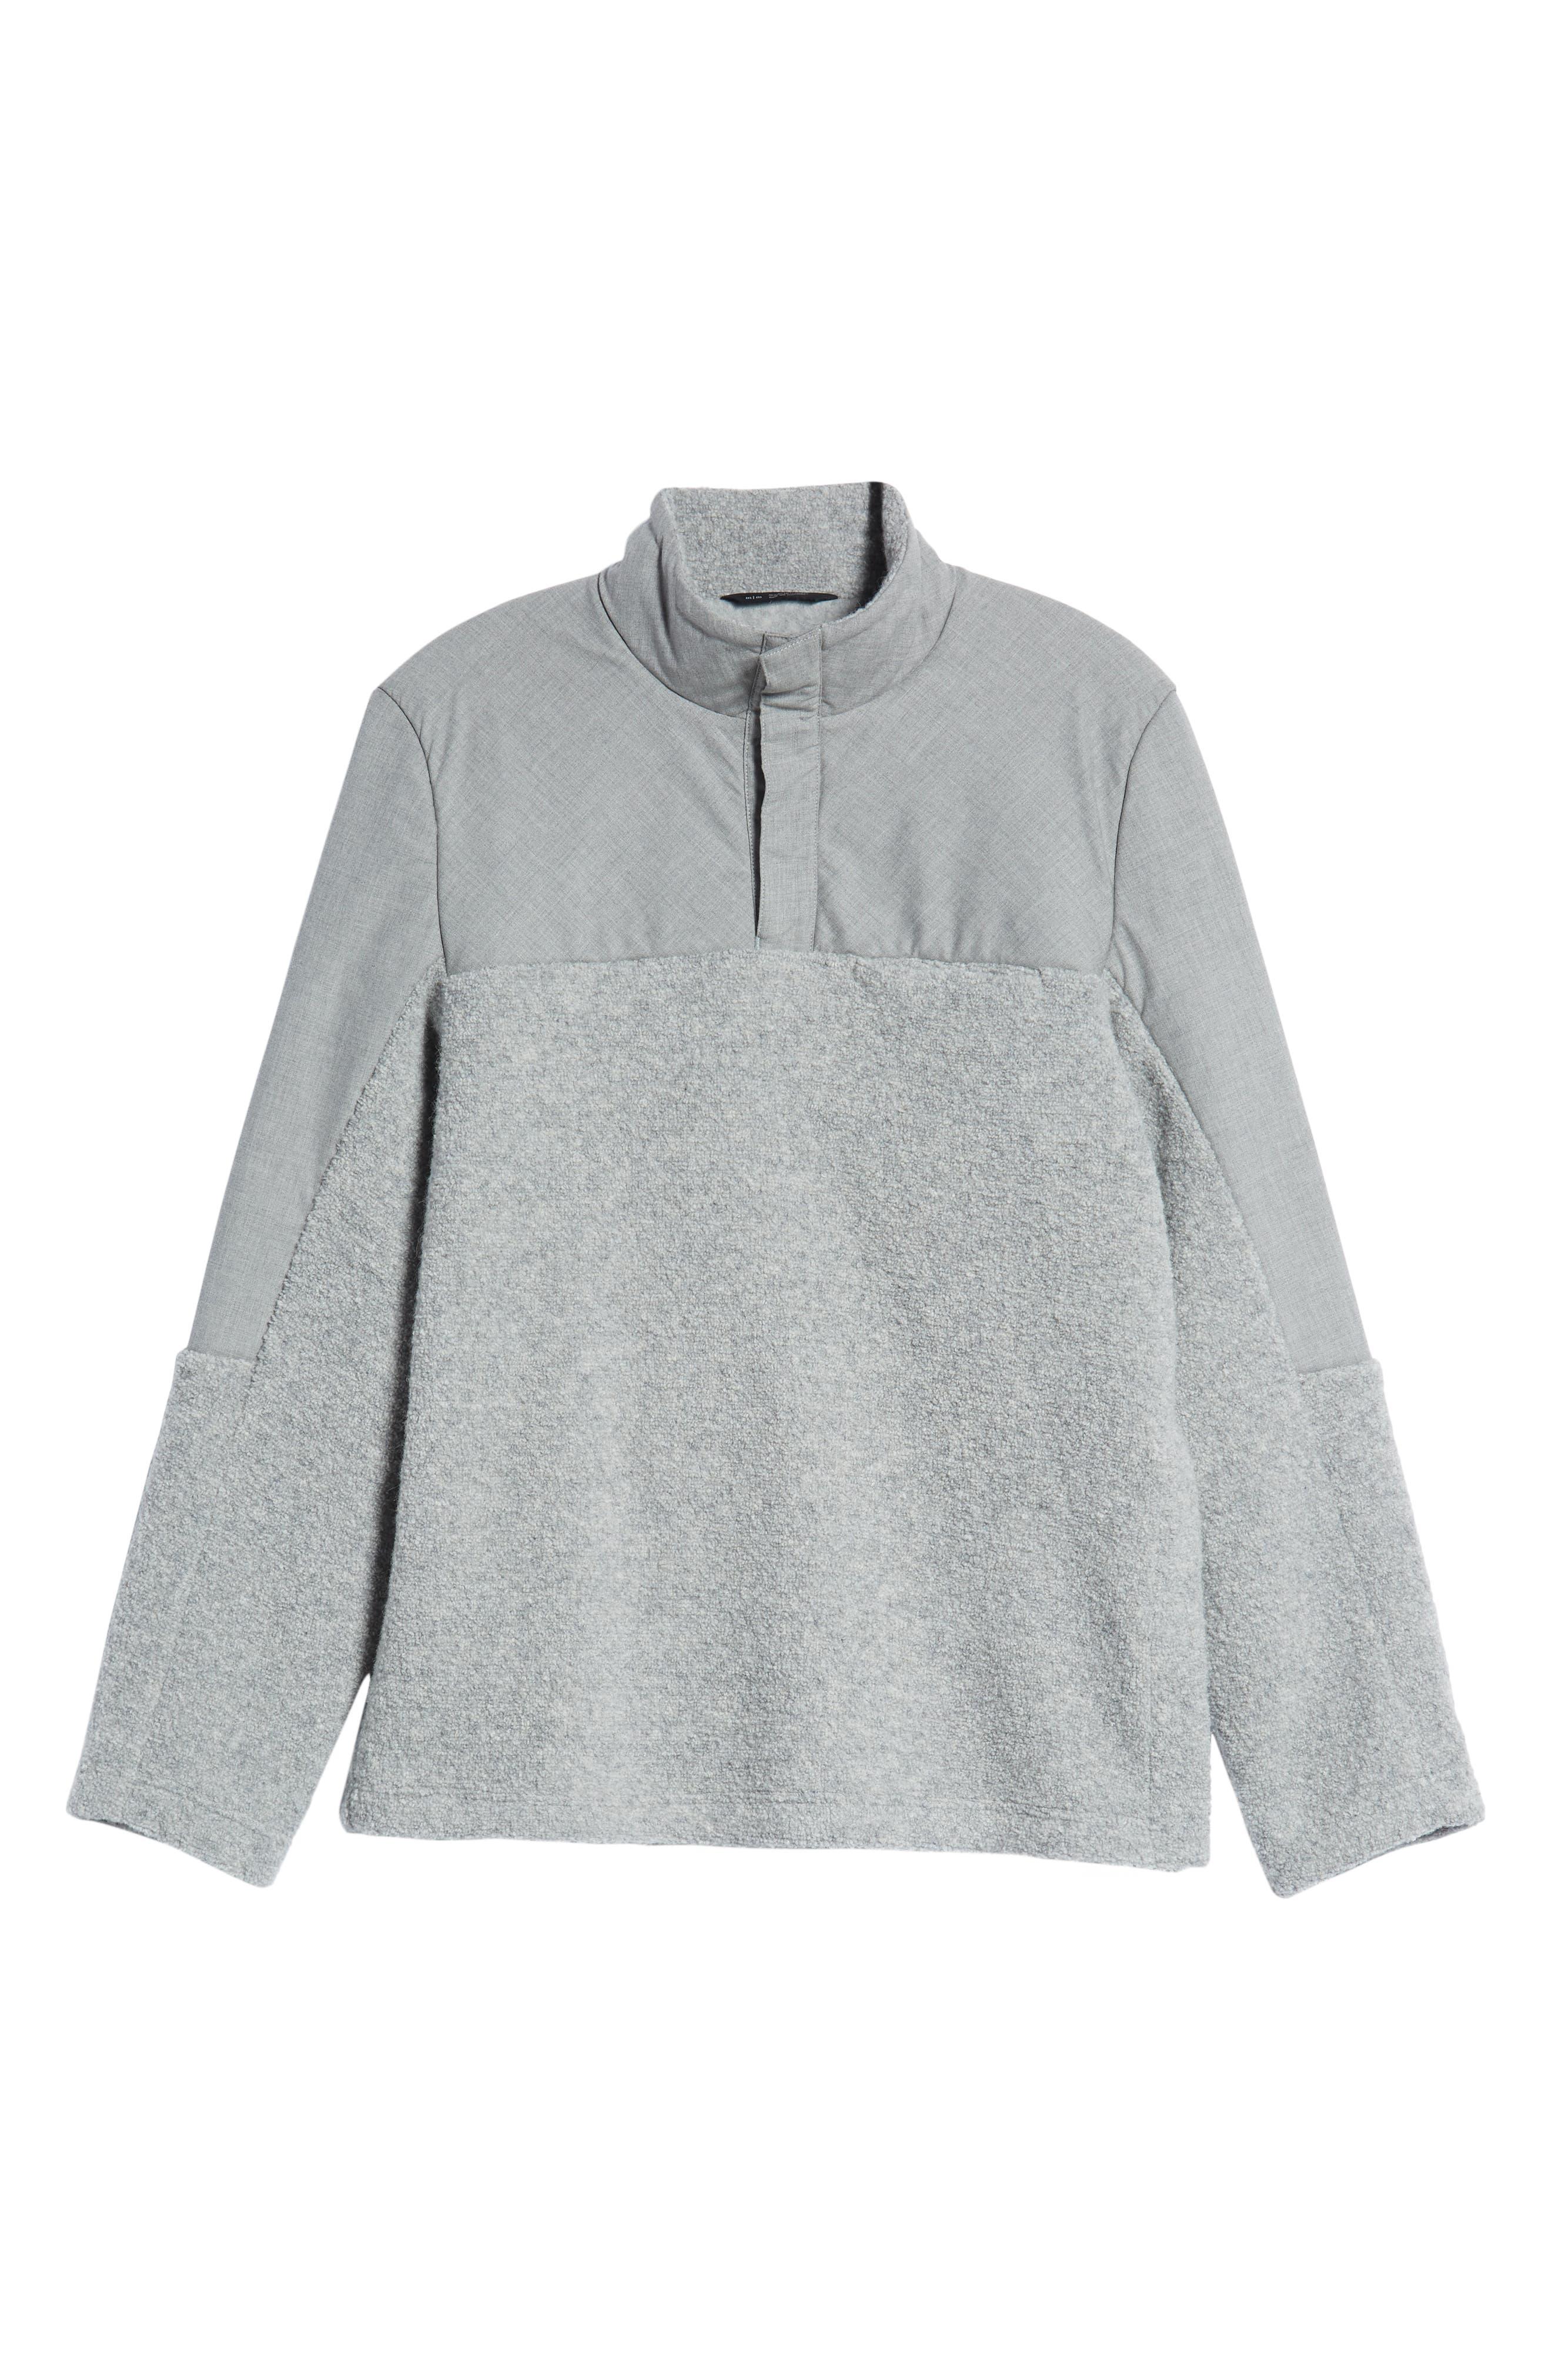 Tactical Fleece Pullover,                             Alternate thumbnail 6, color,                             HEATHER GREY